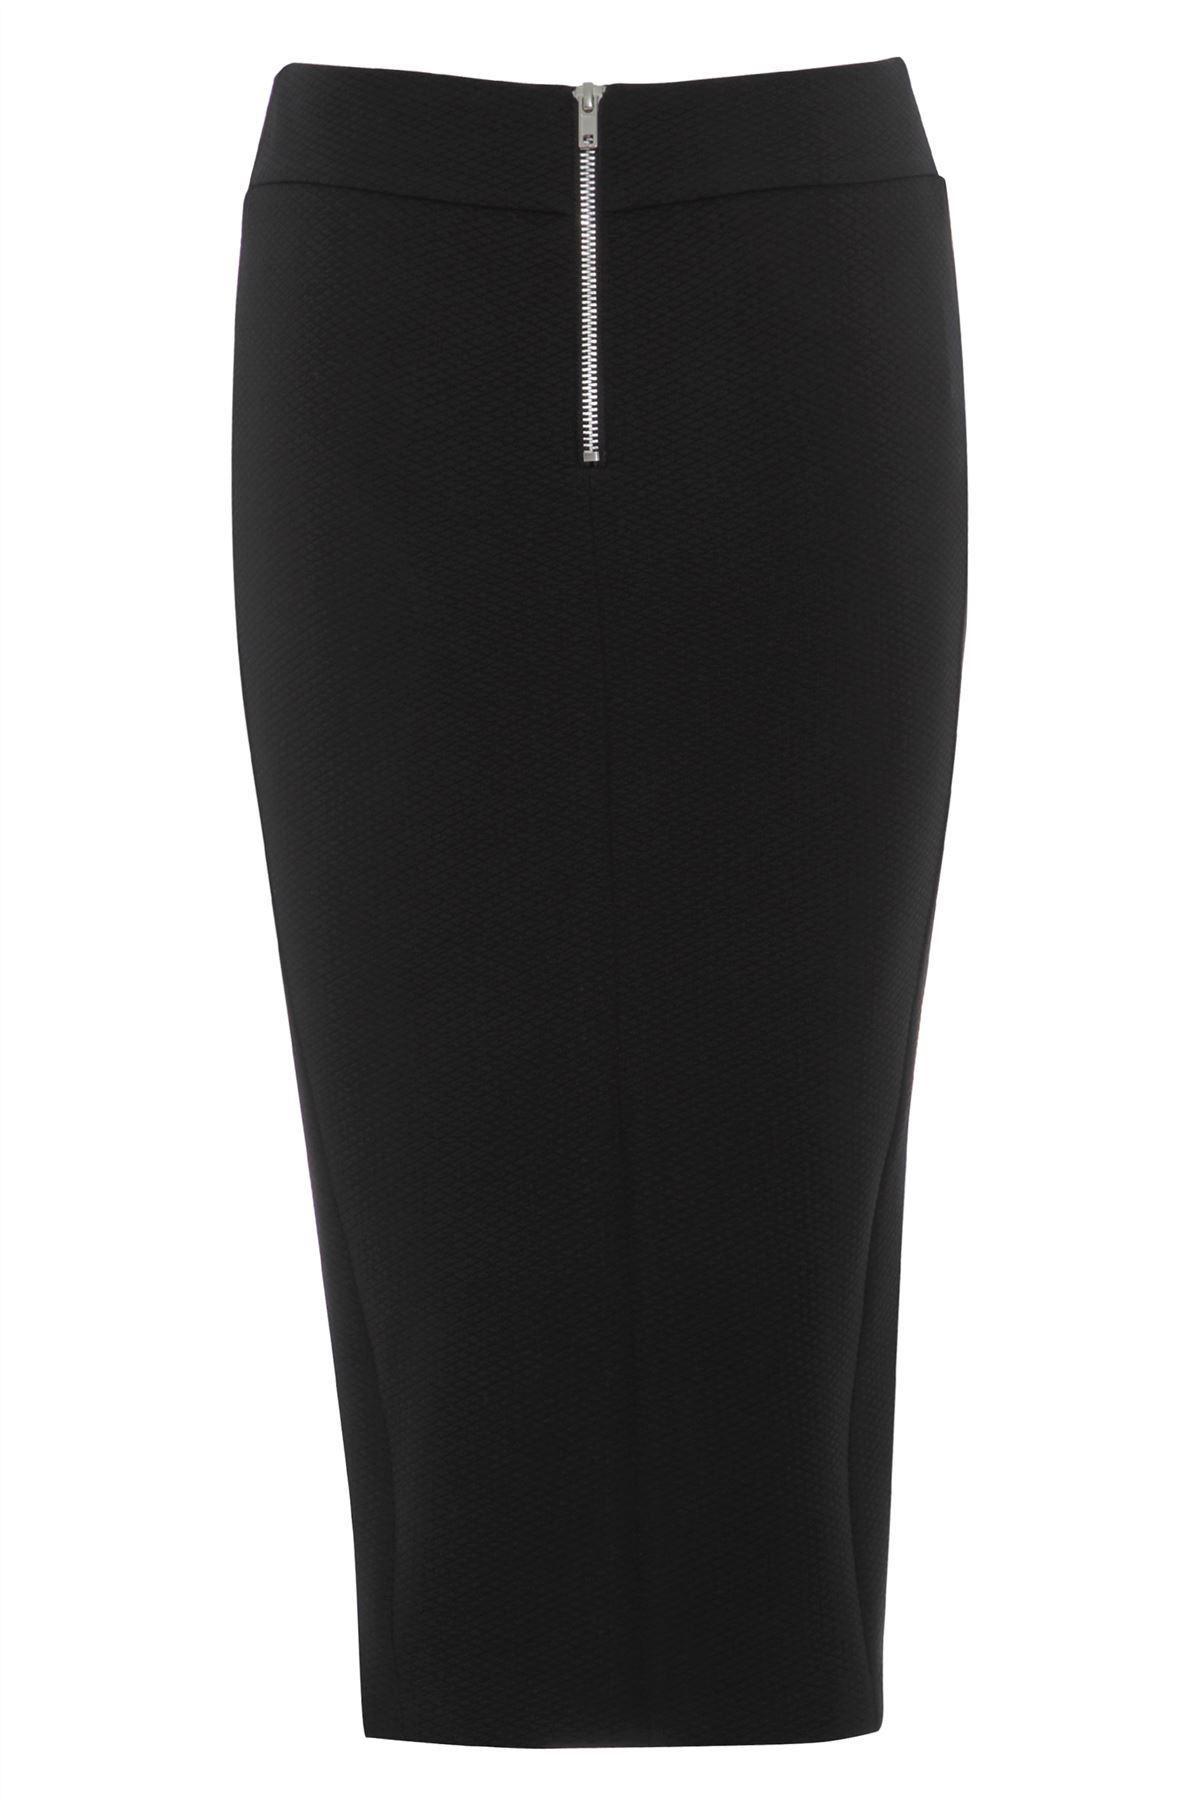 Love2dress Women/'s Evening Black Skirt with White Front Panel